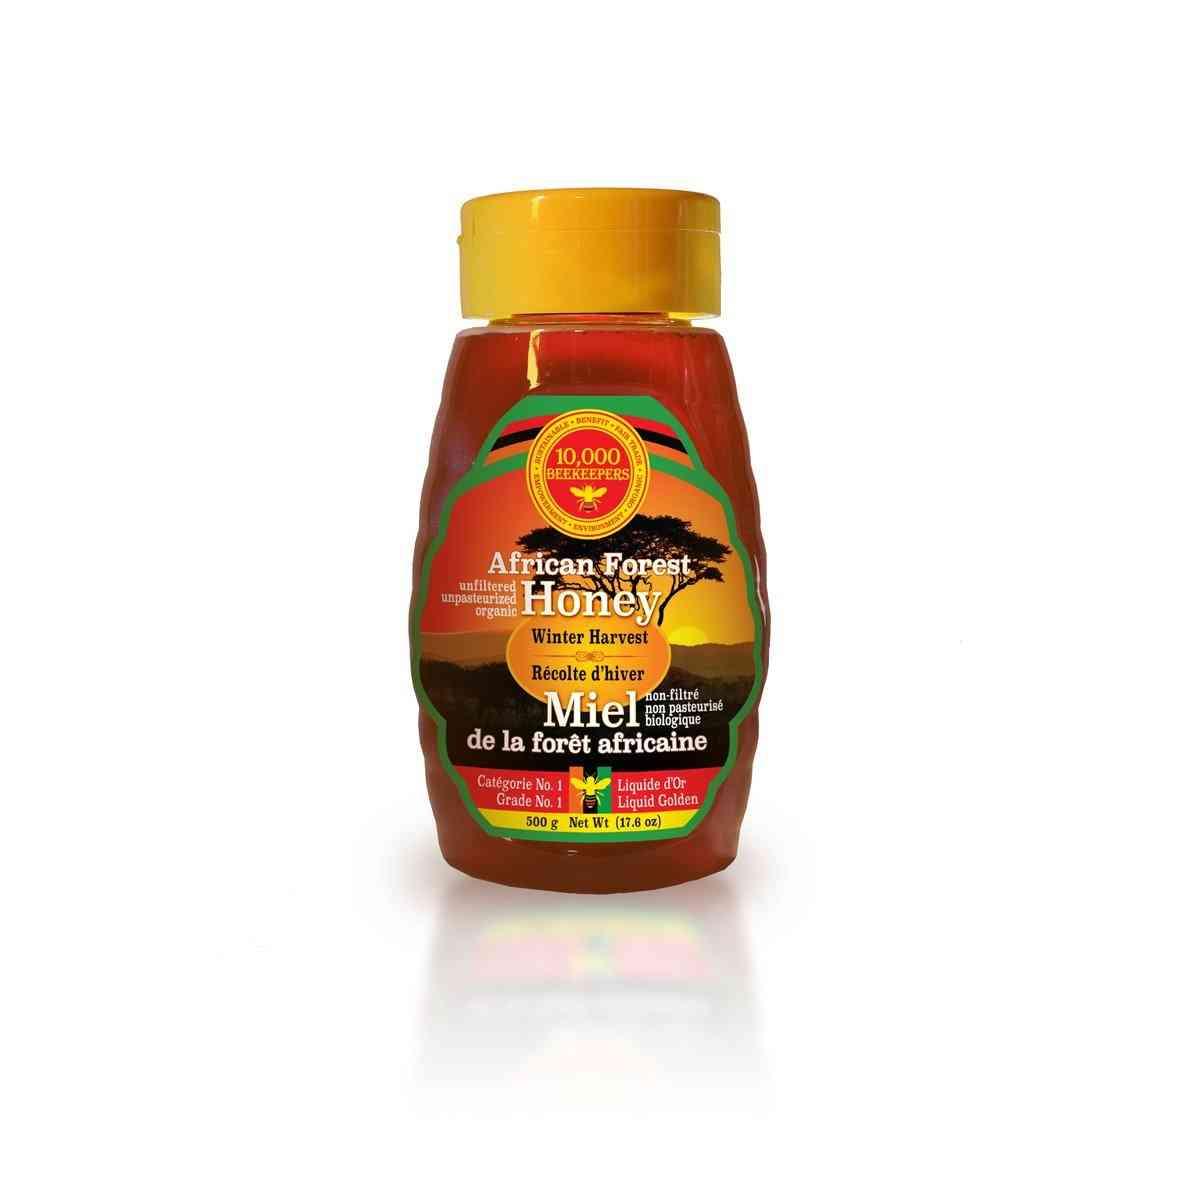 African Forest Honey - Winter Harvest